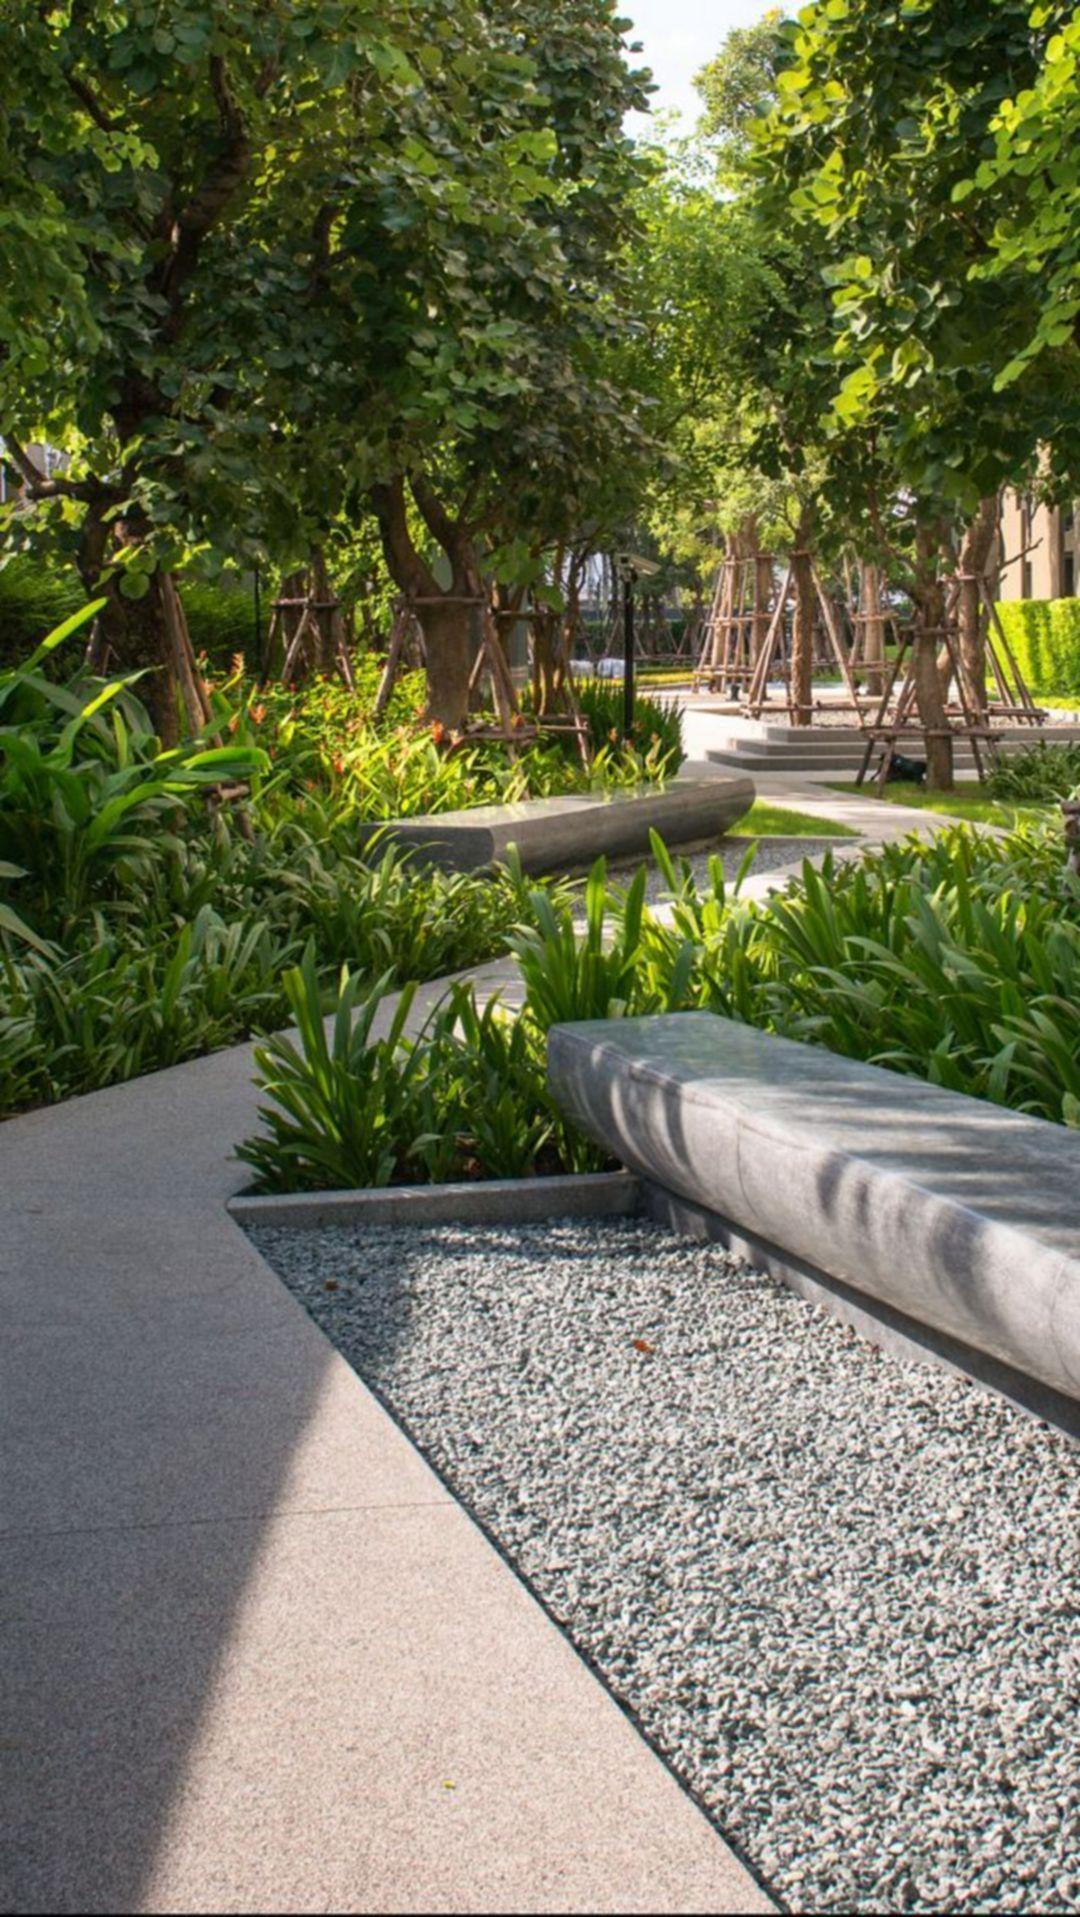 Pin By Jann Rodriguez On Garden Seating In 2020 Landscape Architecture Design Landscape Design Modern Landscaping